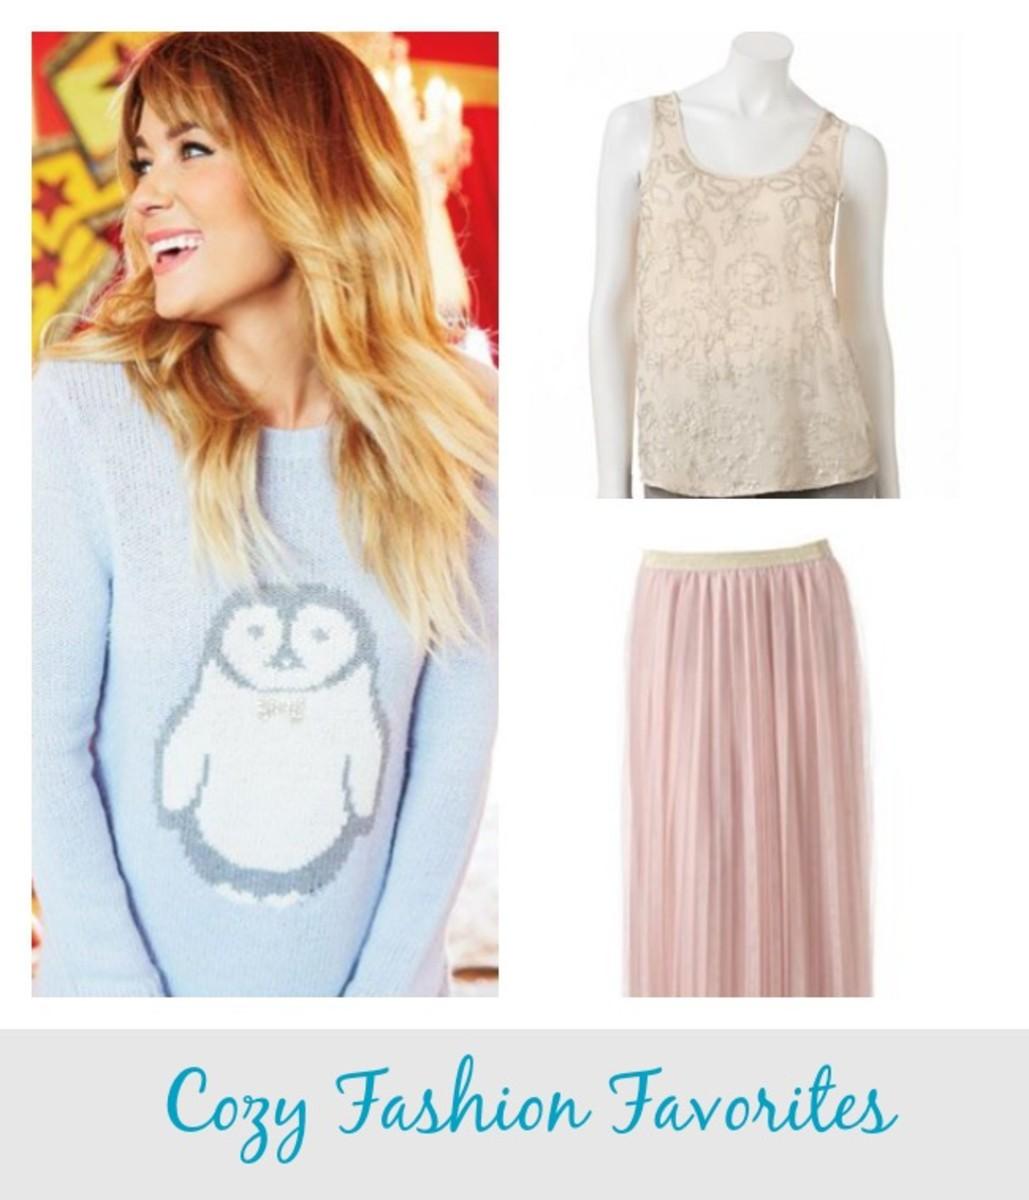 cozy fashion favorites, Lauren Conrad, Kohl's